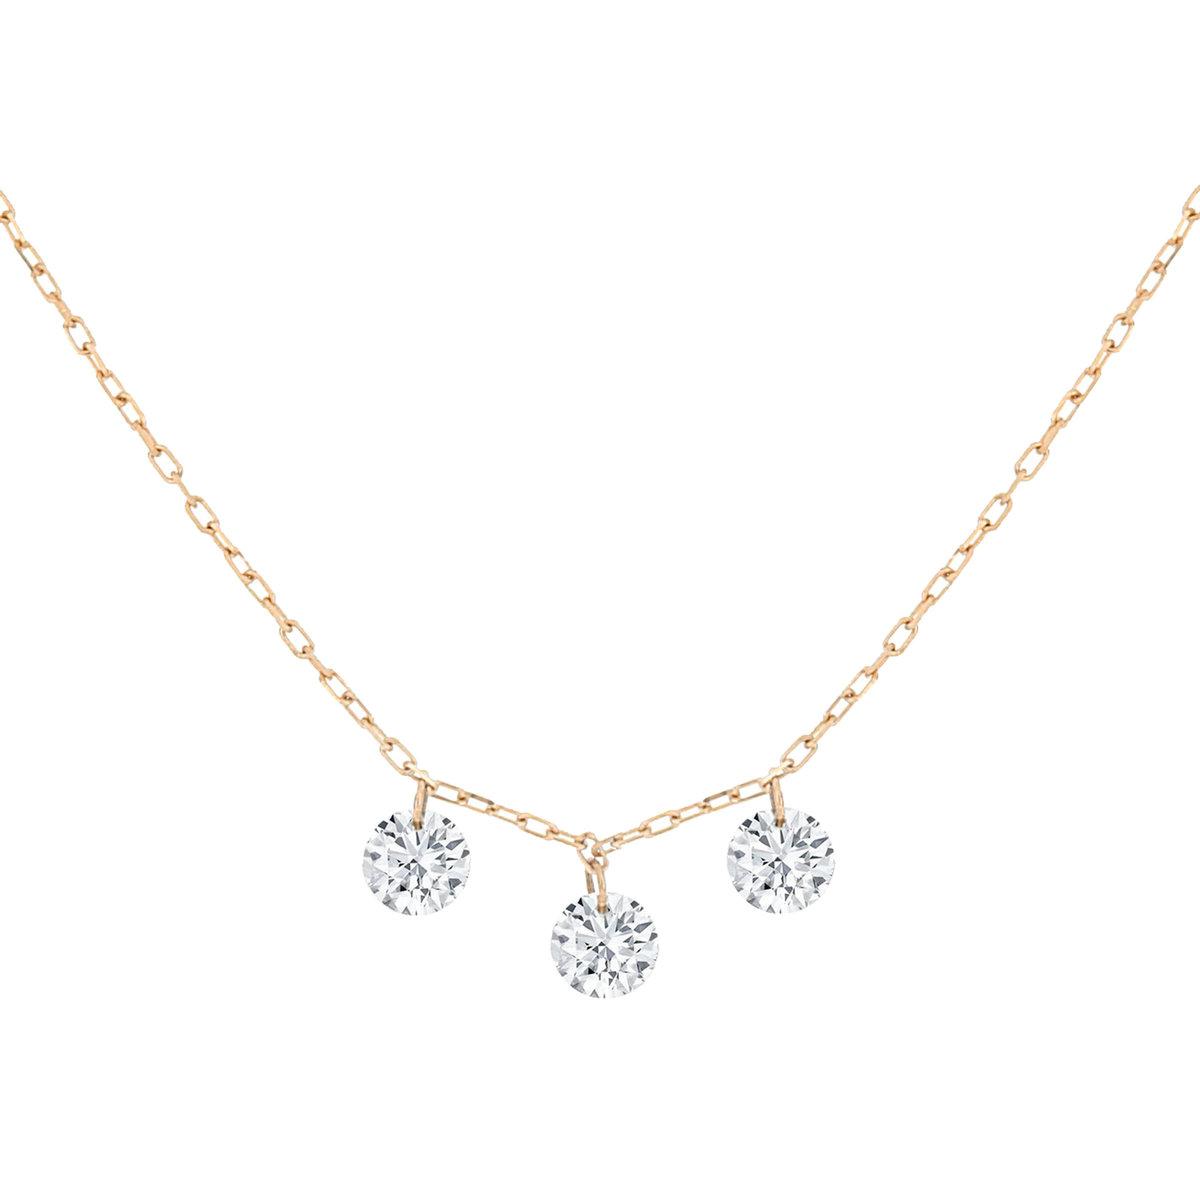 Megan Diamond Necklace